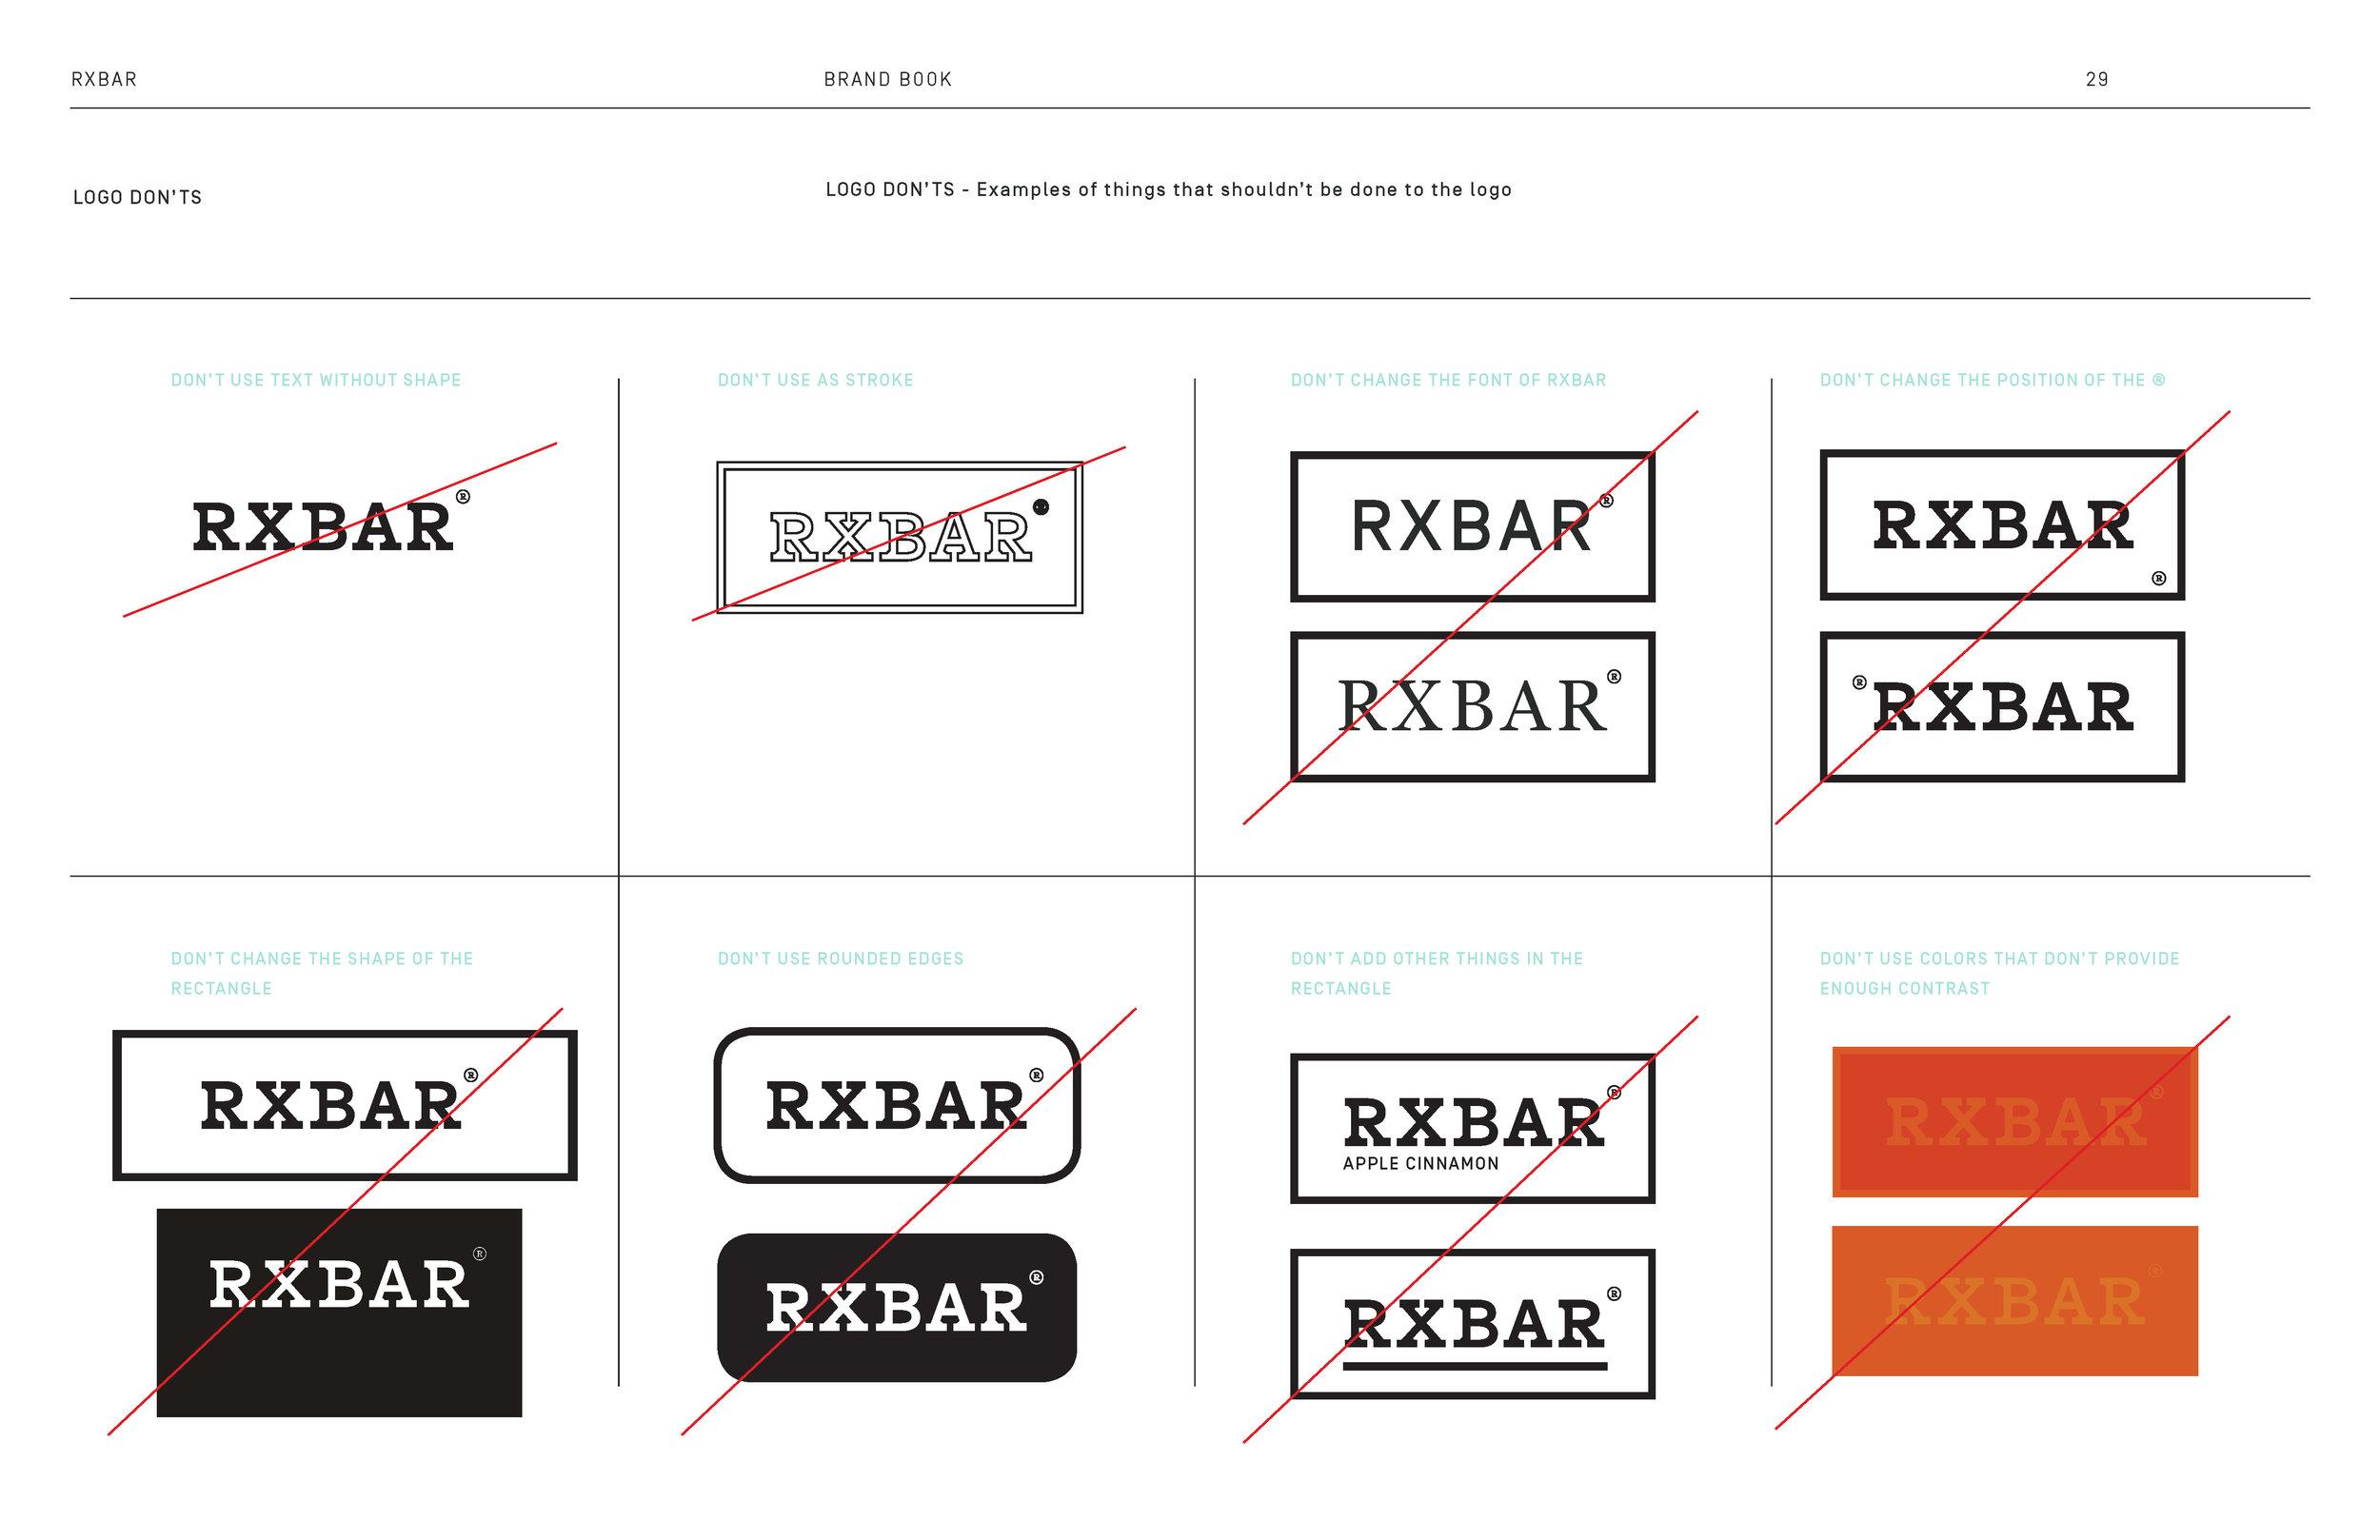 RXBAR_Brand guide_mwf_Page_29.jpg